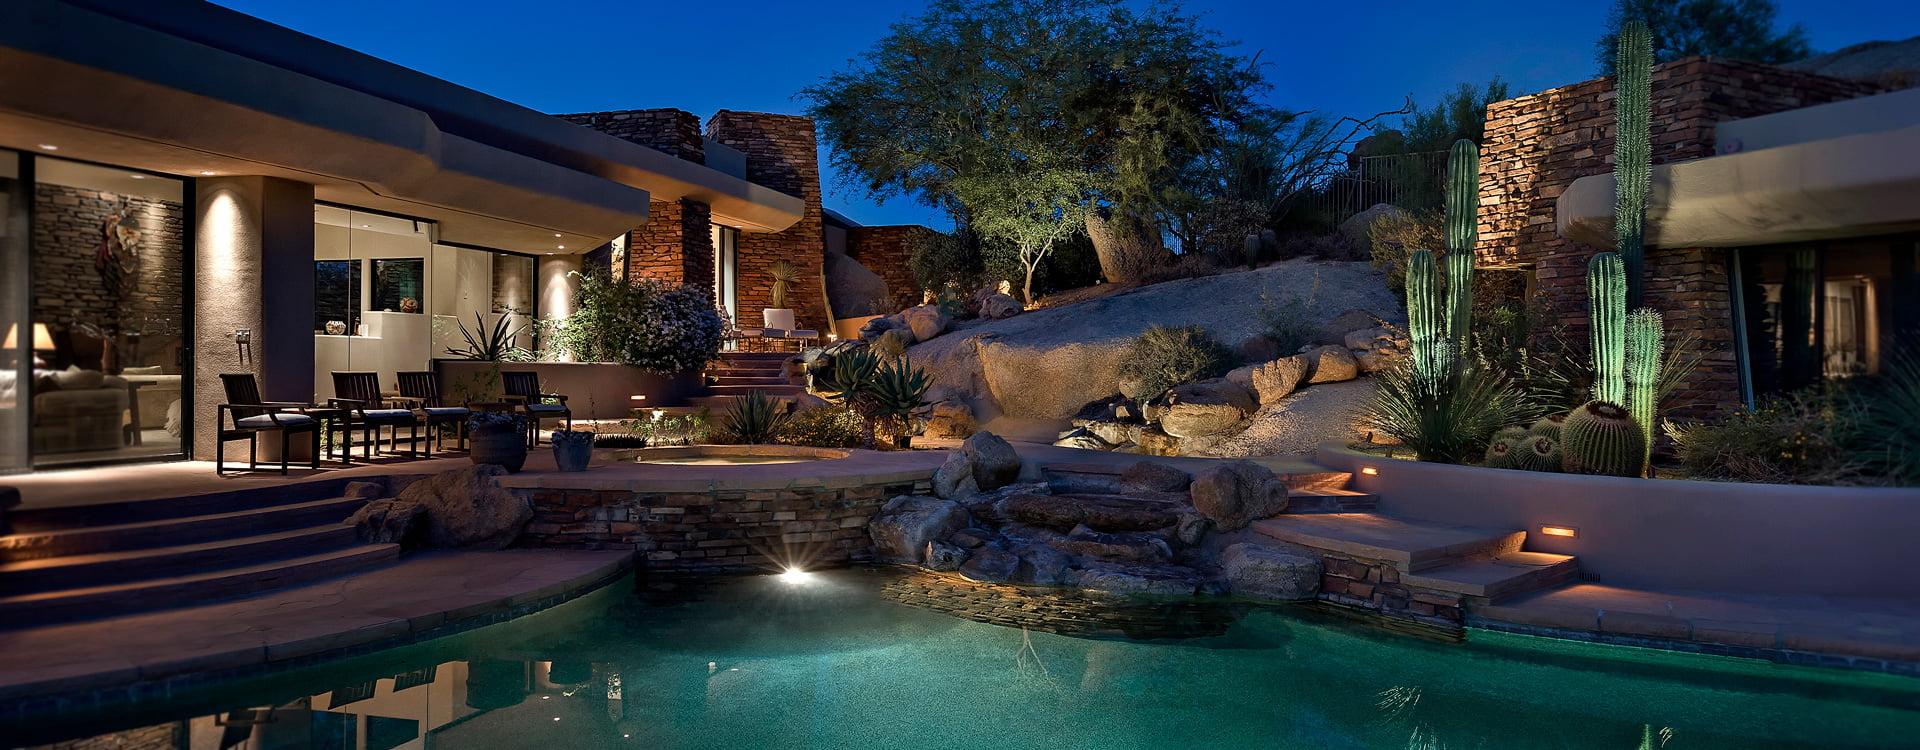 outdoor deck and landscape lighting